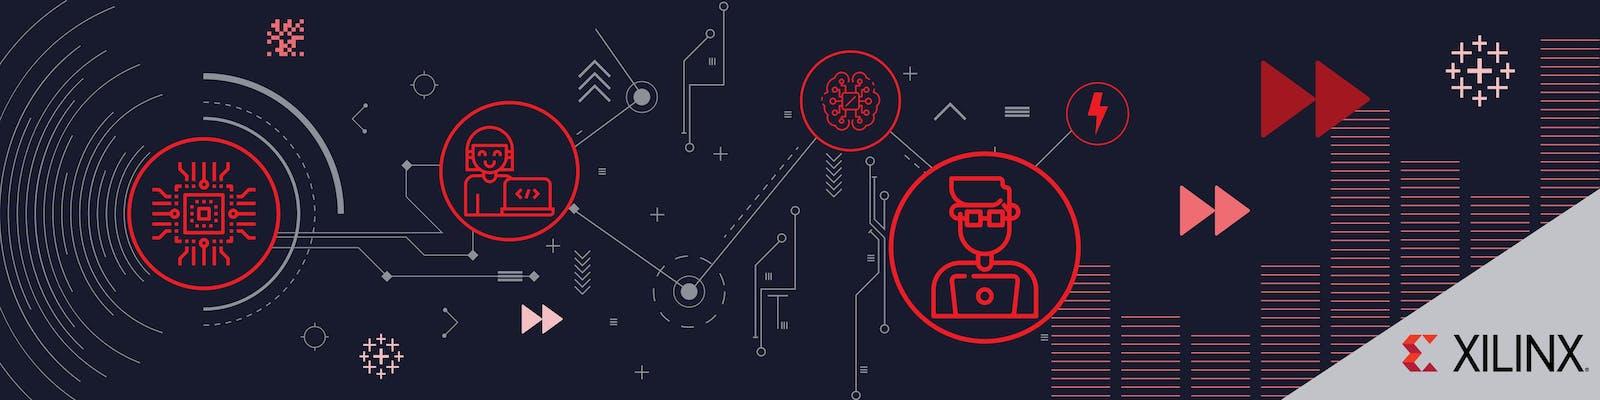 Adaptive Computing Developer Contest